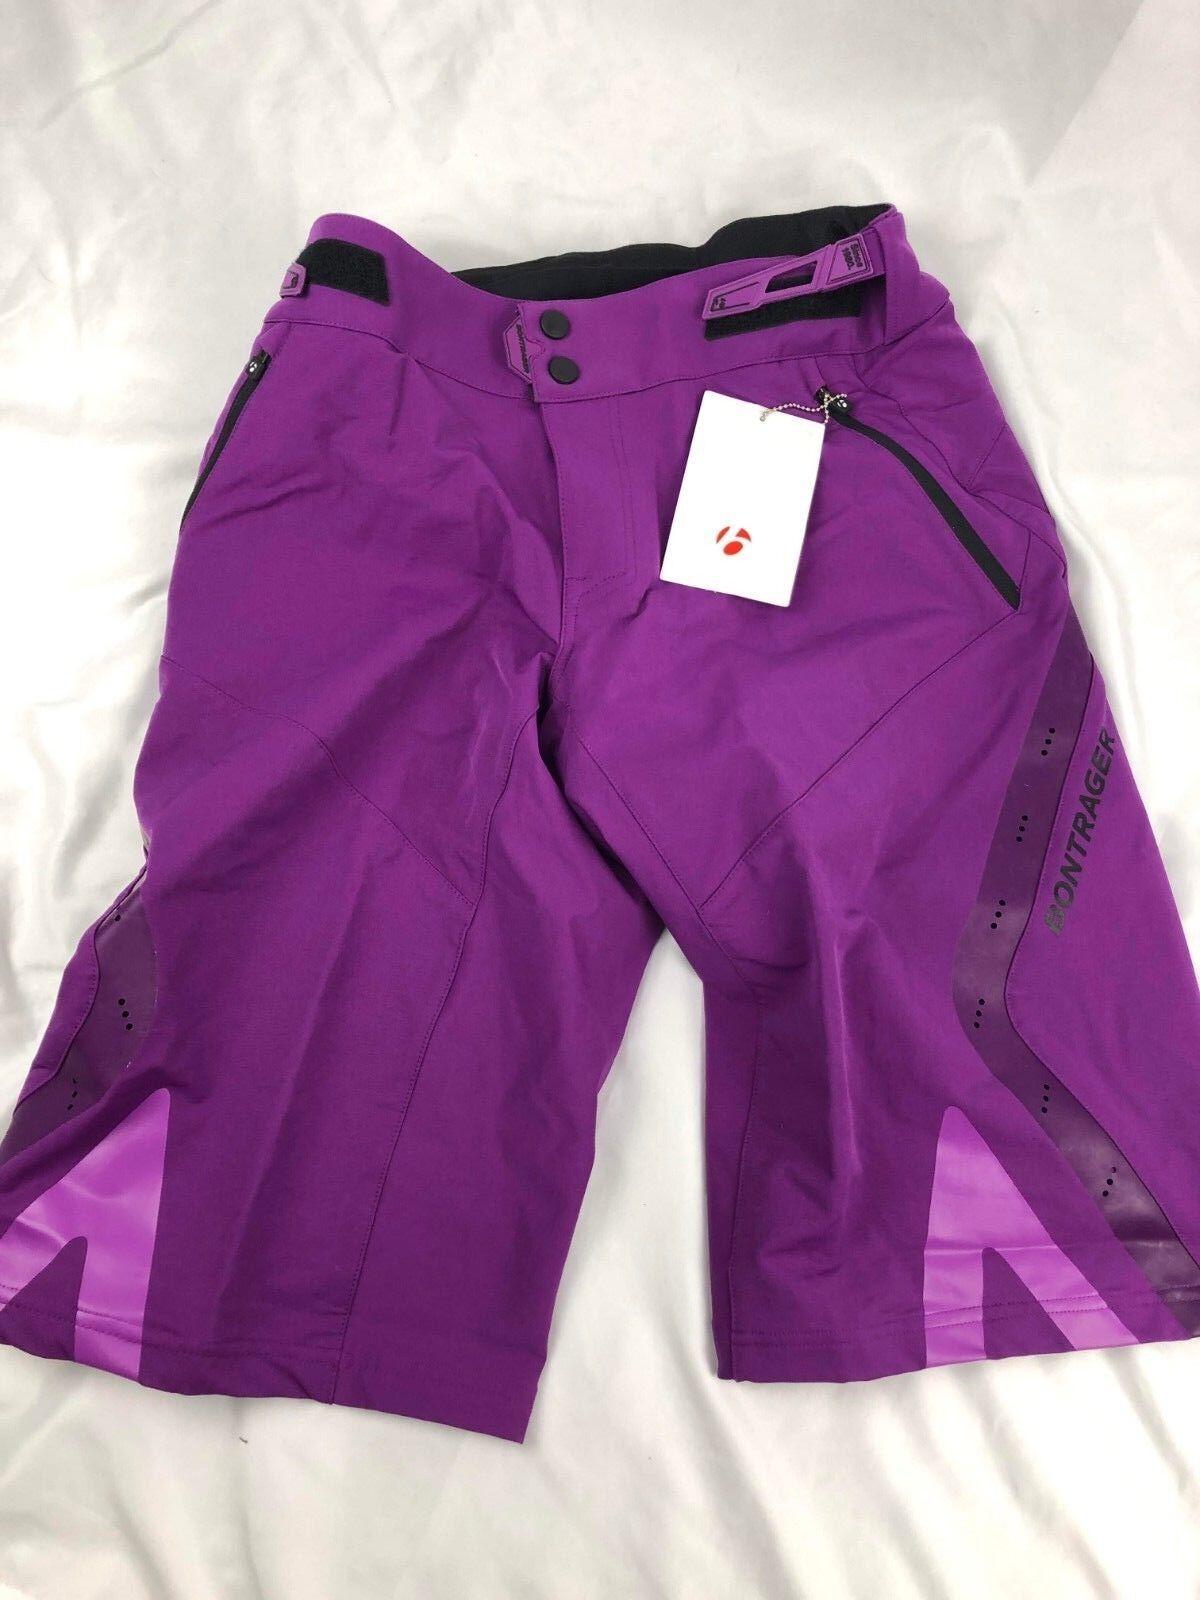 Bontrager Lithos Men's MTB Shorts Dimensione Medium viola 3h